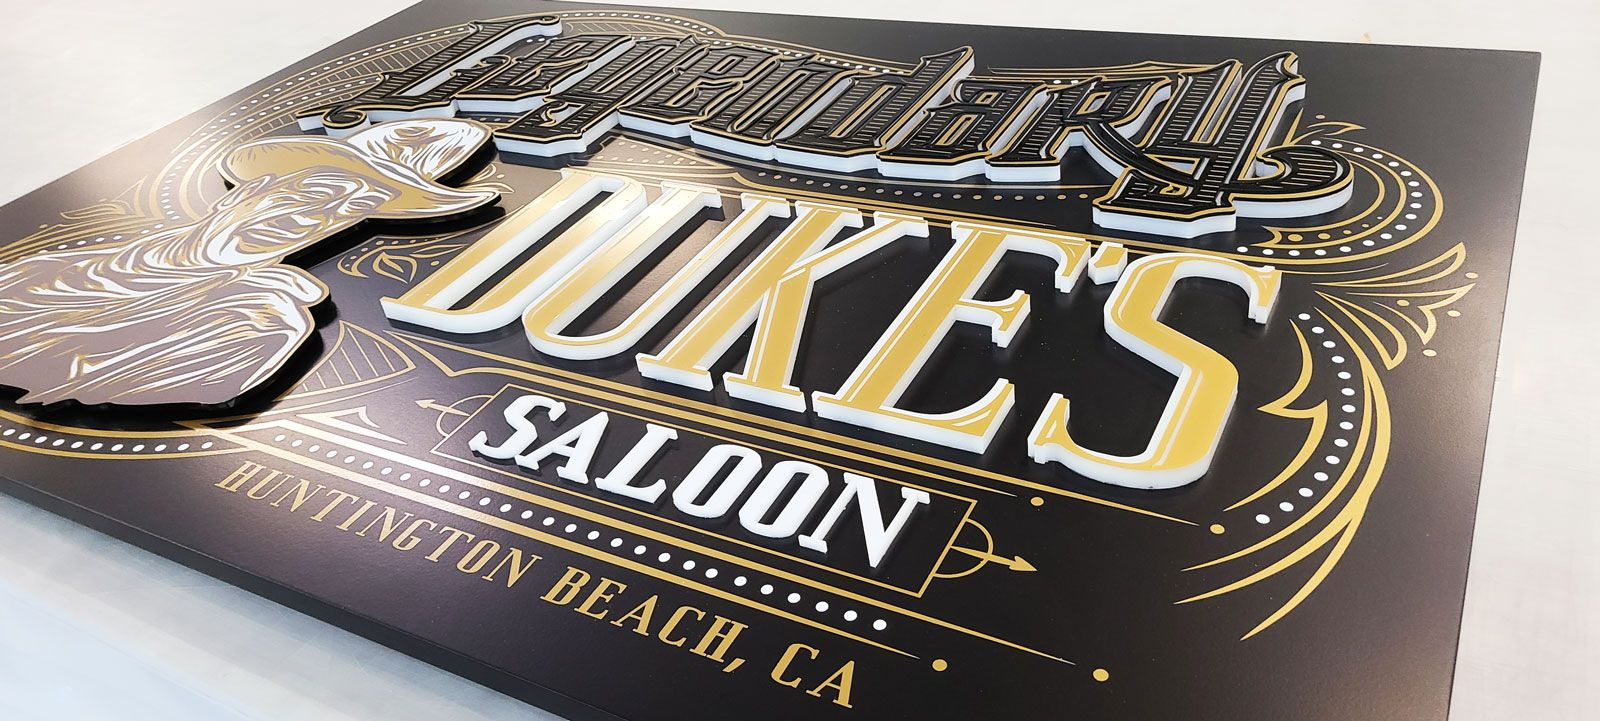 Duke's saloon push through sign